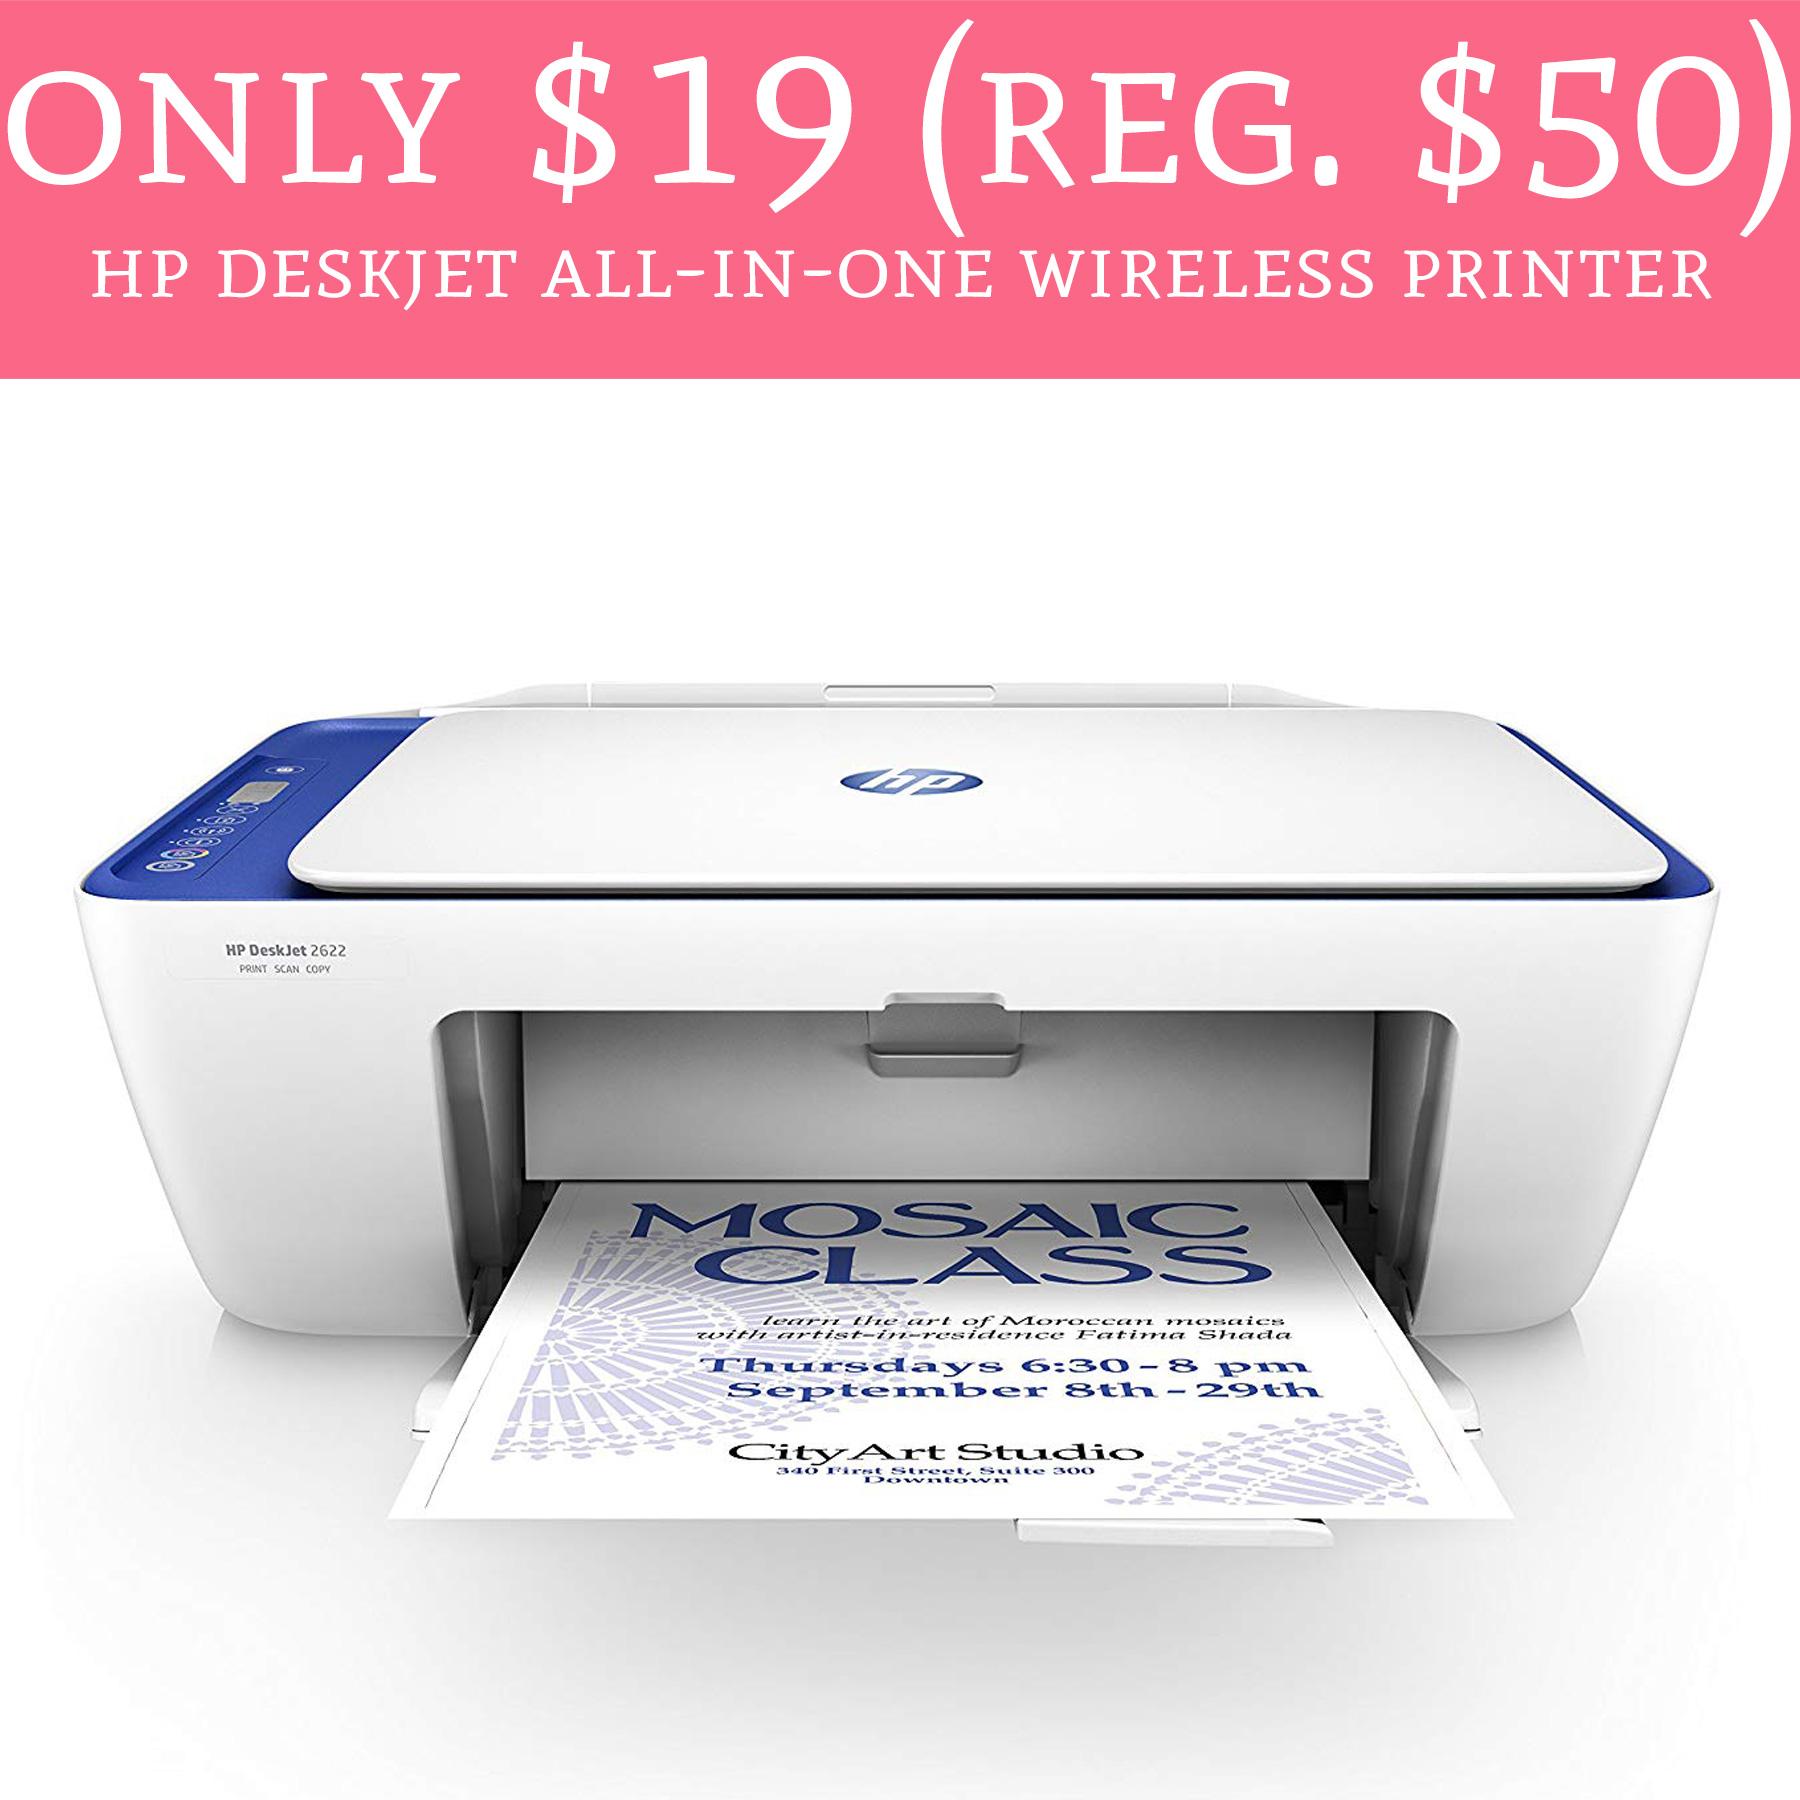 Only $19 (Regular $50) HP Deskjet All-in-One Wireless